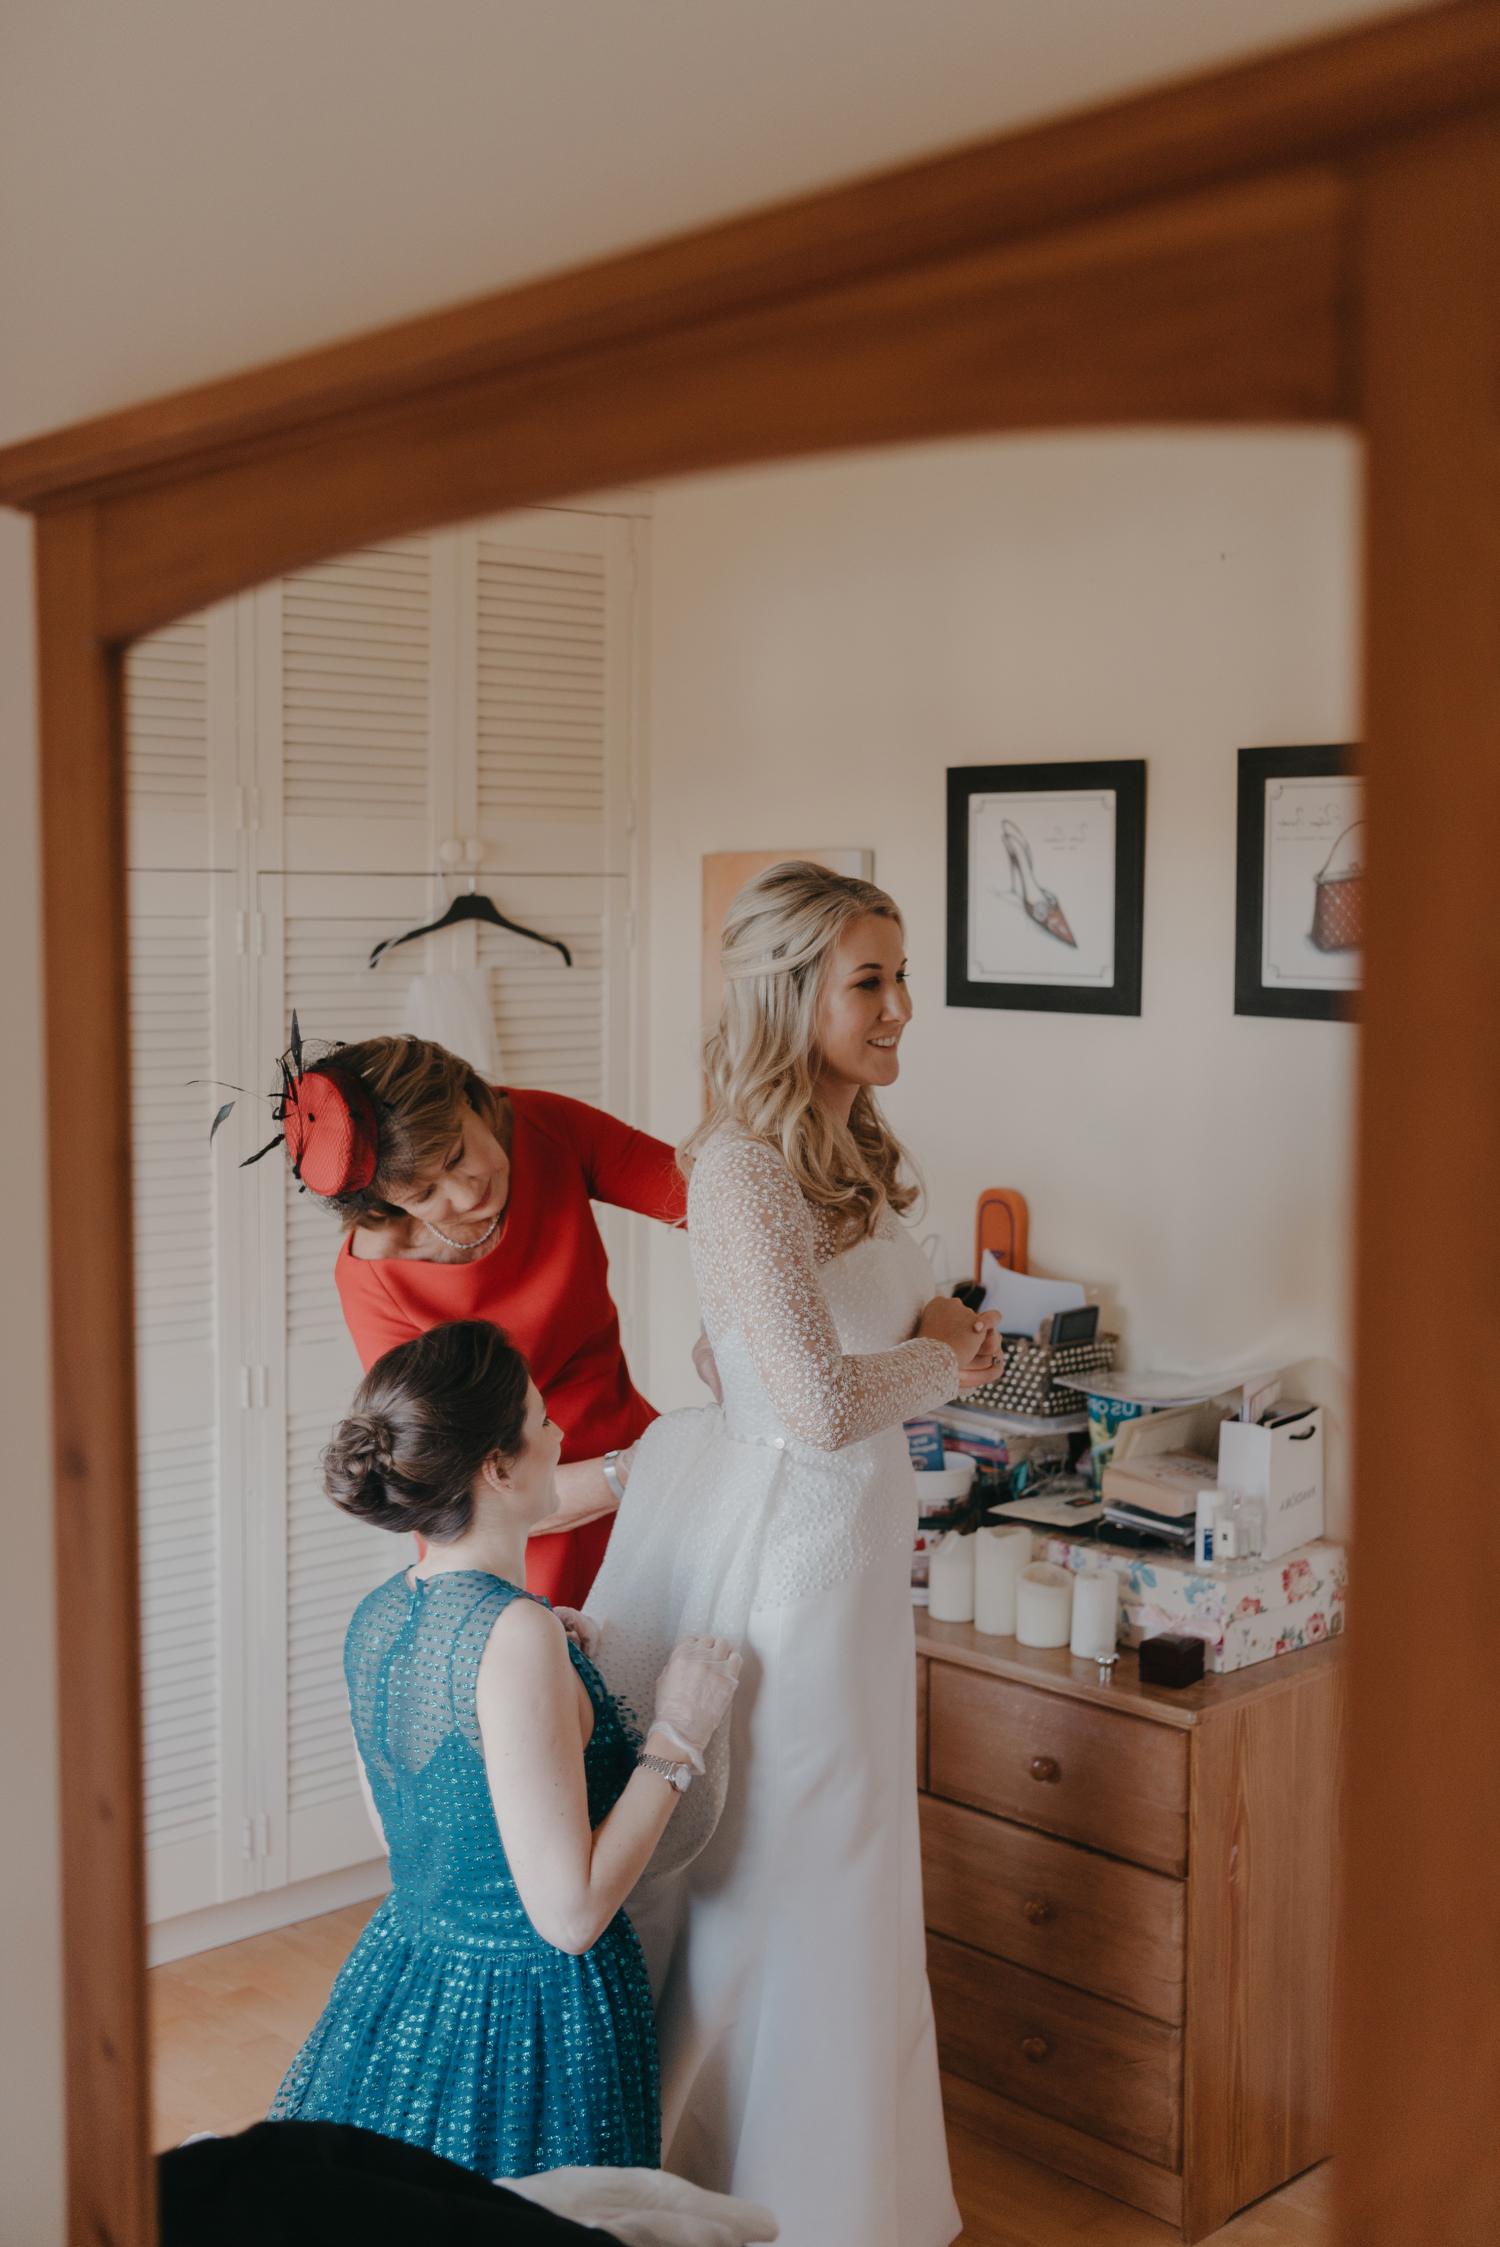 clonwilliam-house-wedding-photographer-037.jpg